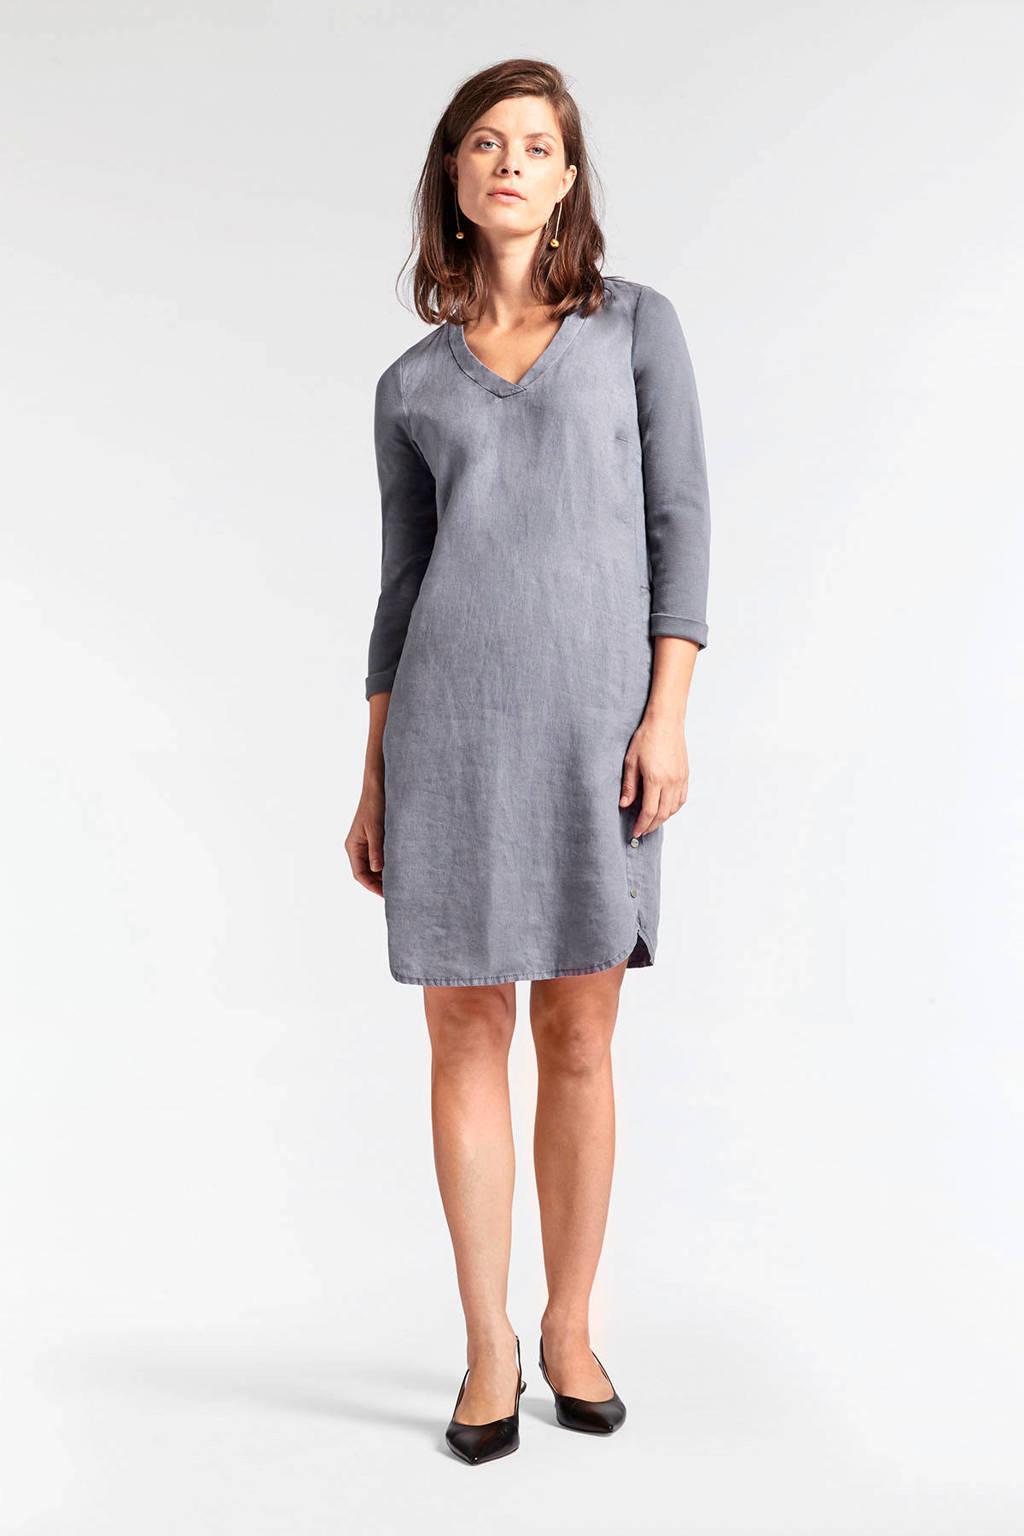 Sandwich linnen A-lijn jurk grijsblauw, Grijsblauw